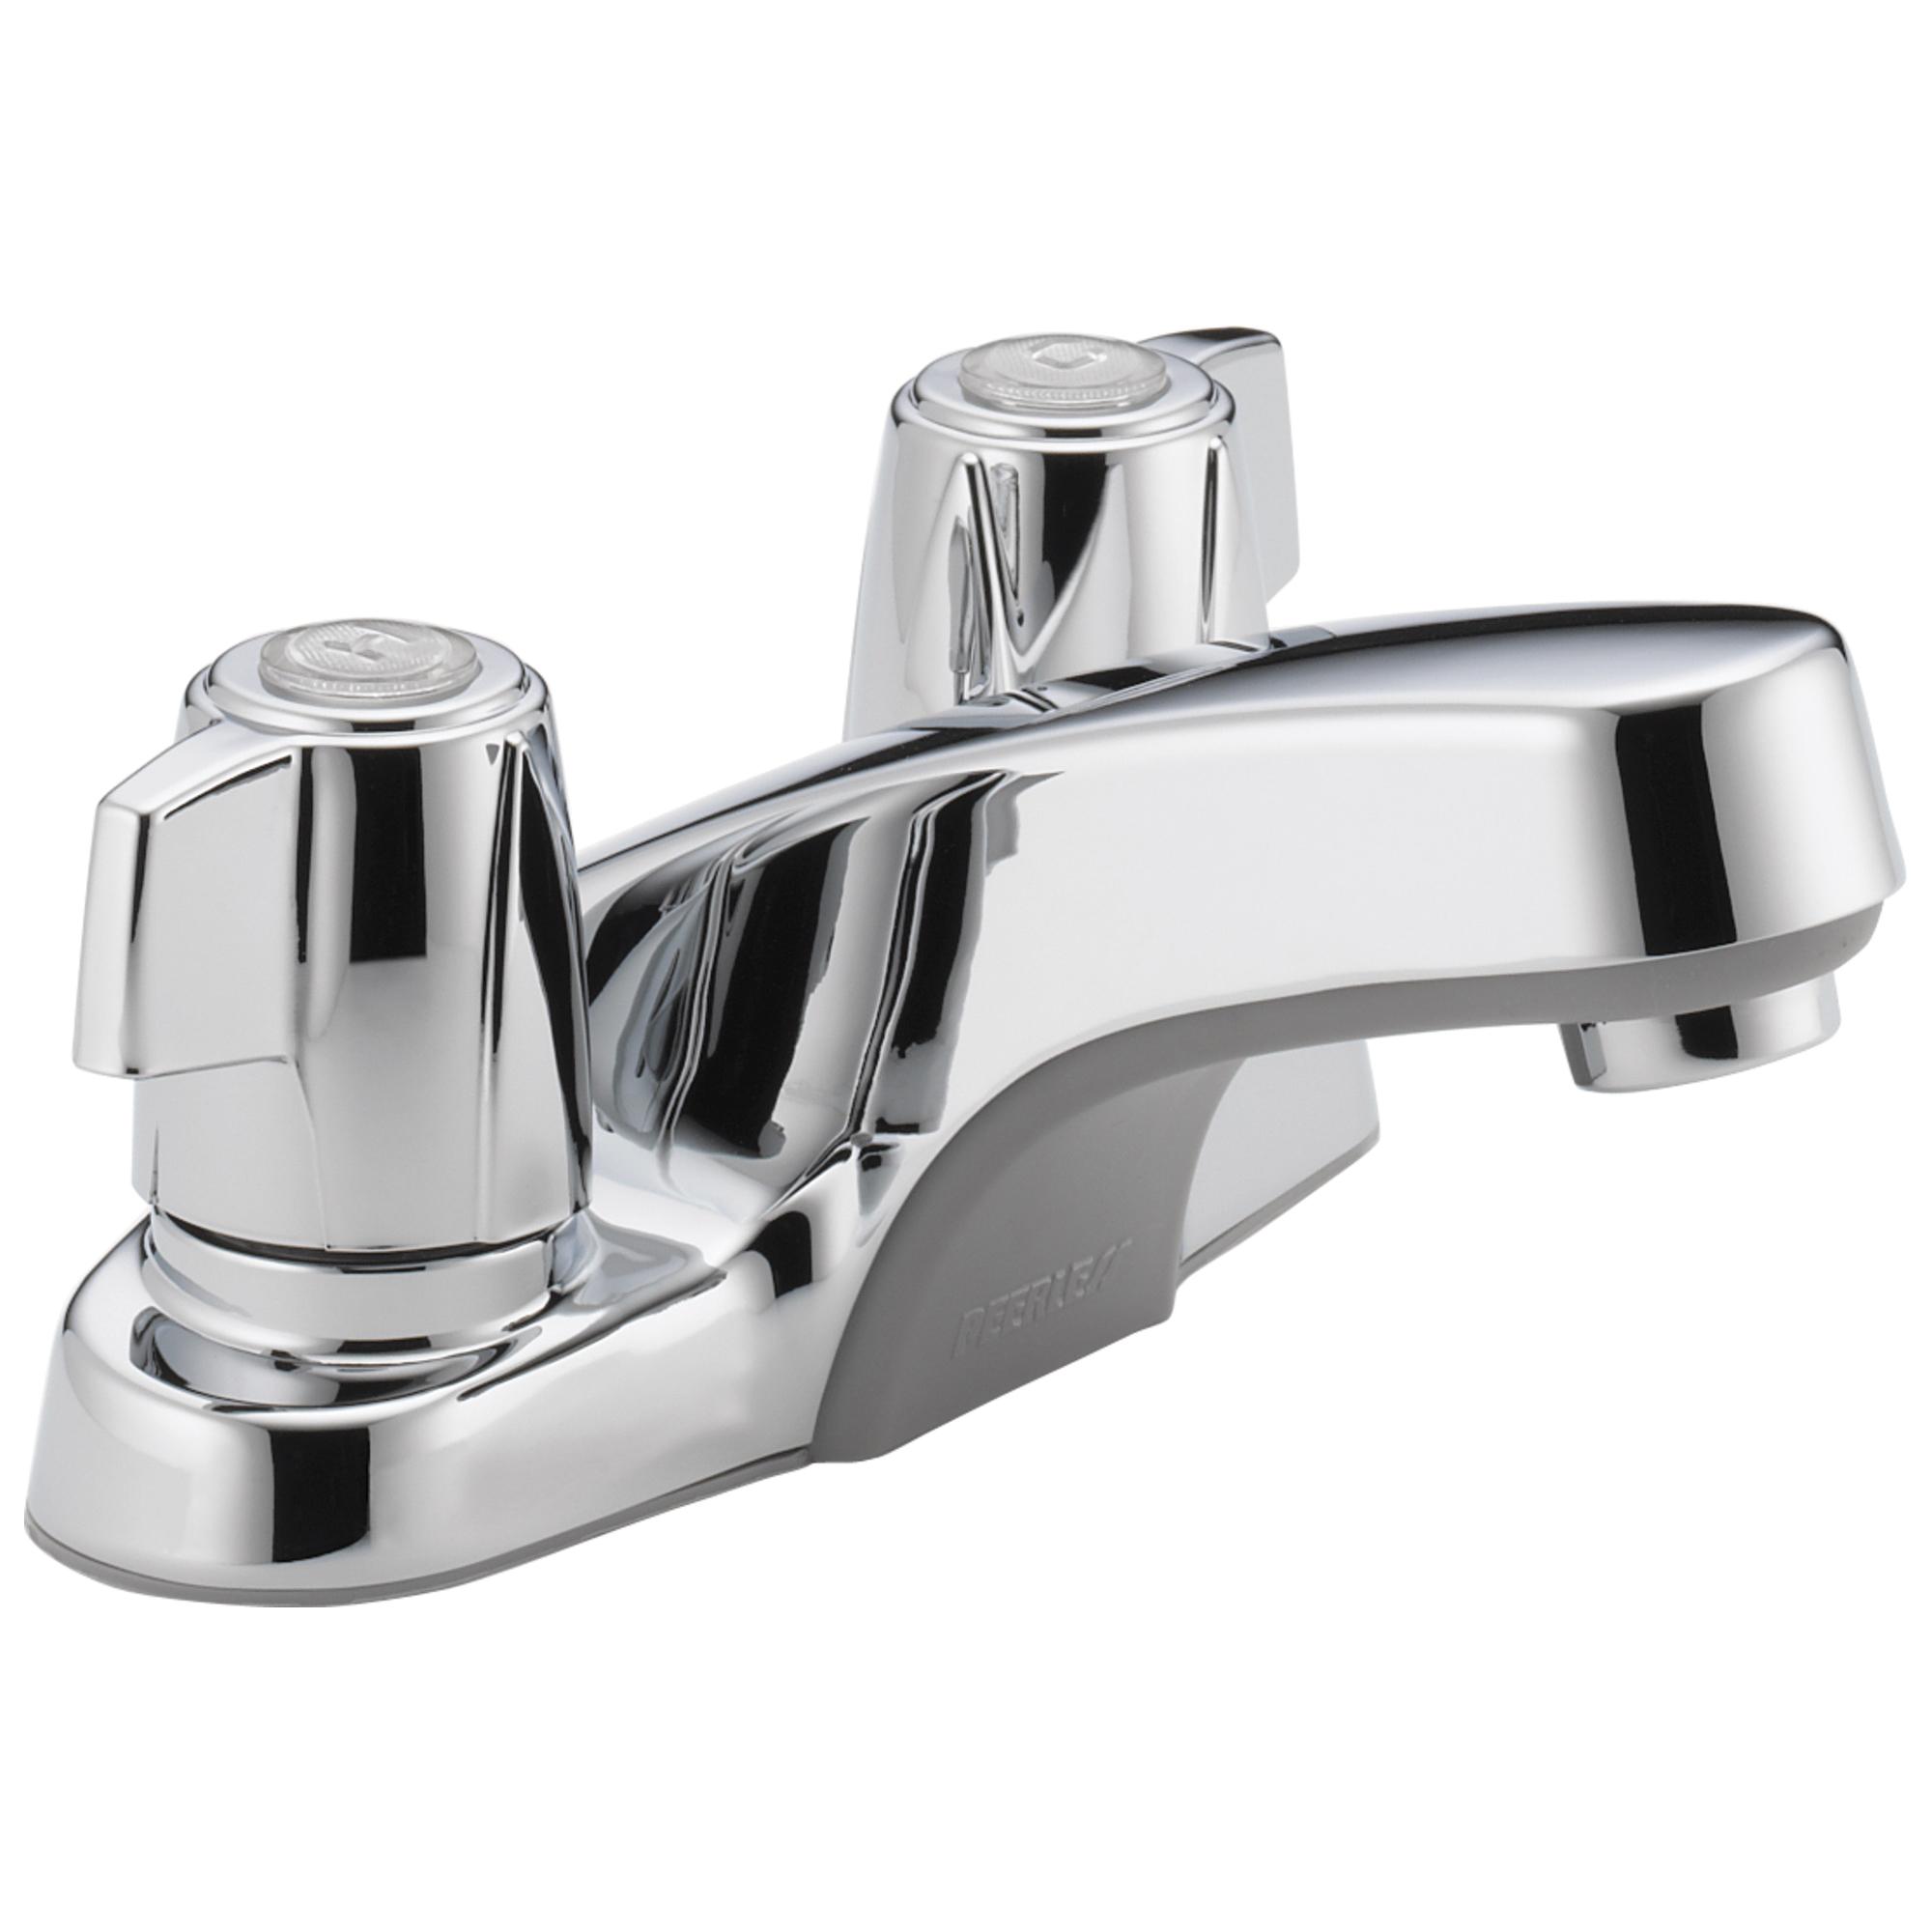 Peerless® P241LF Centerset Lavatory Faucet, Chrome Plated, 2 Handles, 1.2 gpm